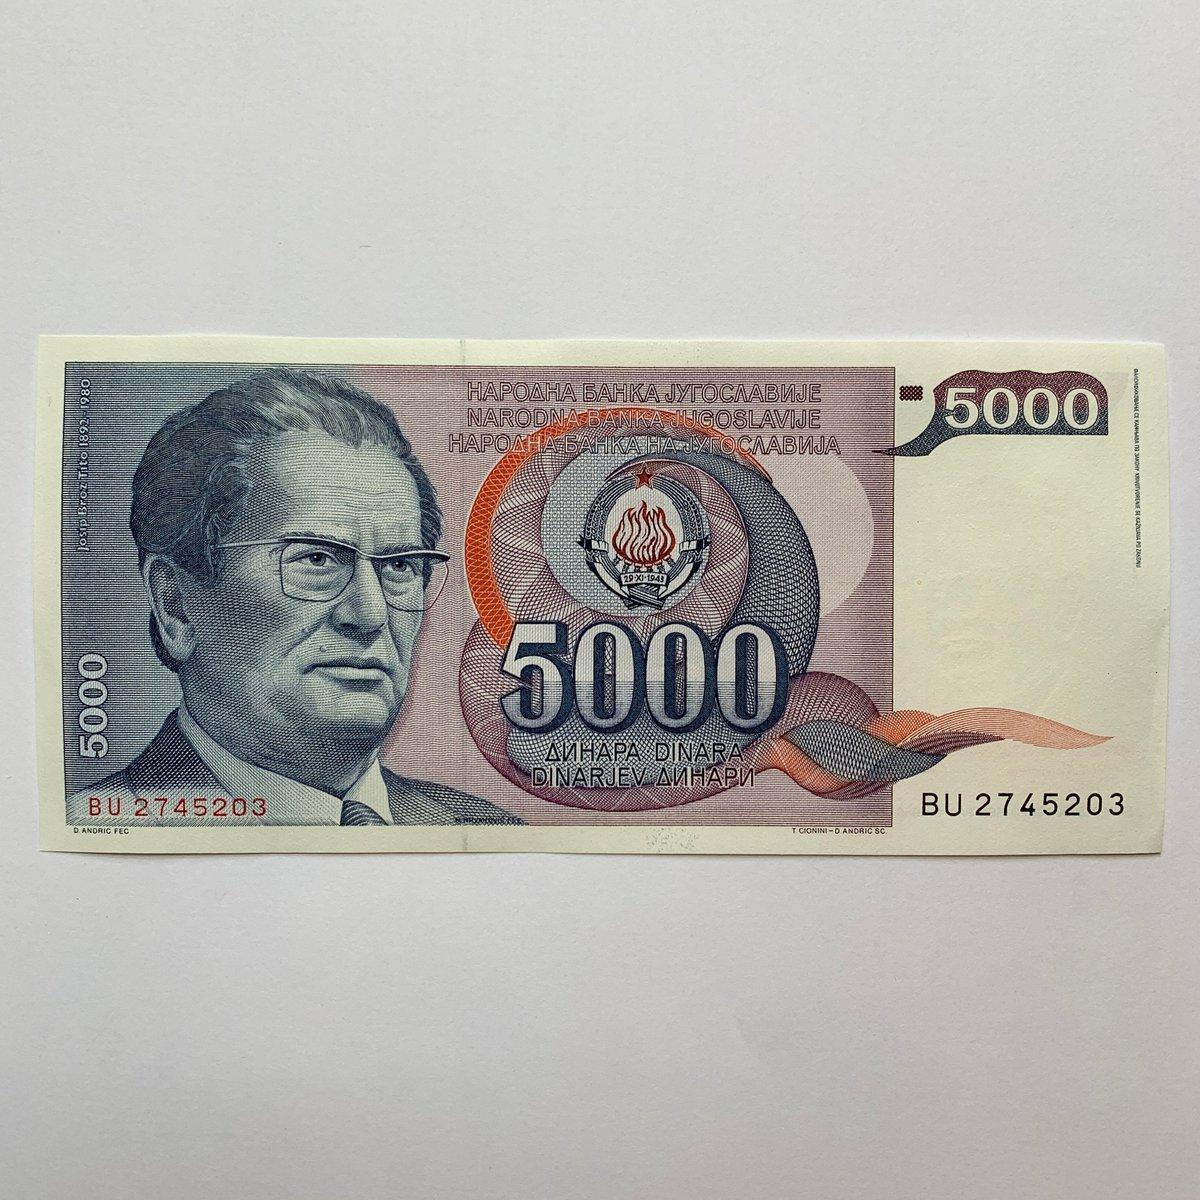 my #etsy shop: Josip Broz Tito Yugoslavia 5000 Dinara Banknote. Serbia, Macedonia, Bosnia, Montenegro, Kosovo, Slovenia, Croatia Currency, Billetes. Notes.  #banknote #billetes #currency #bills #pesos #dollars #coins #collectibles #vintage